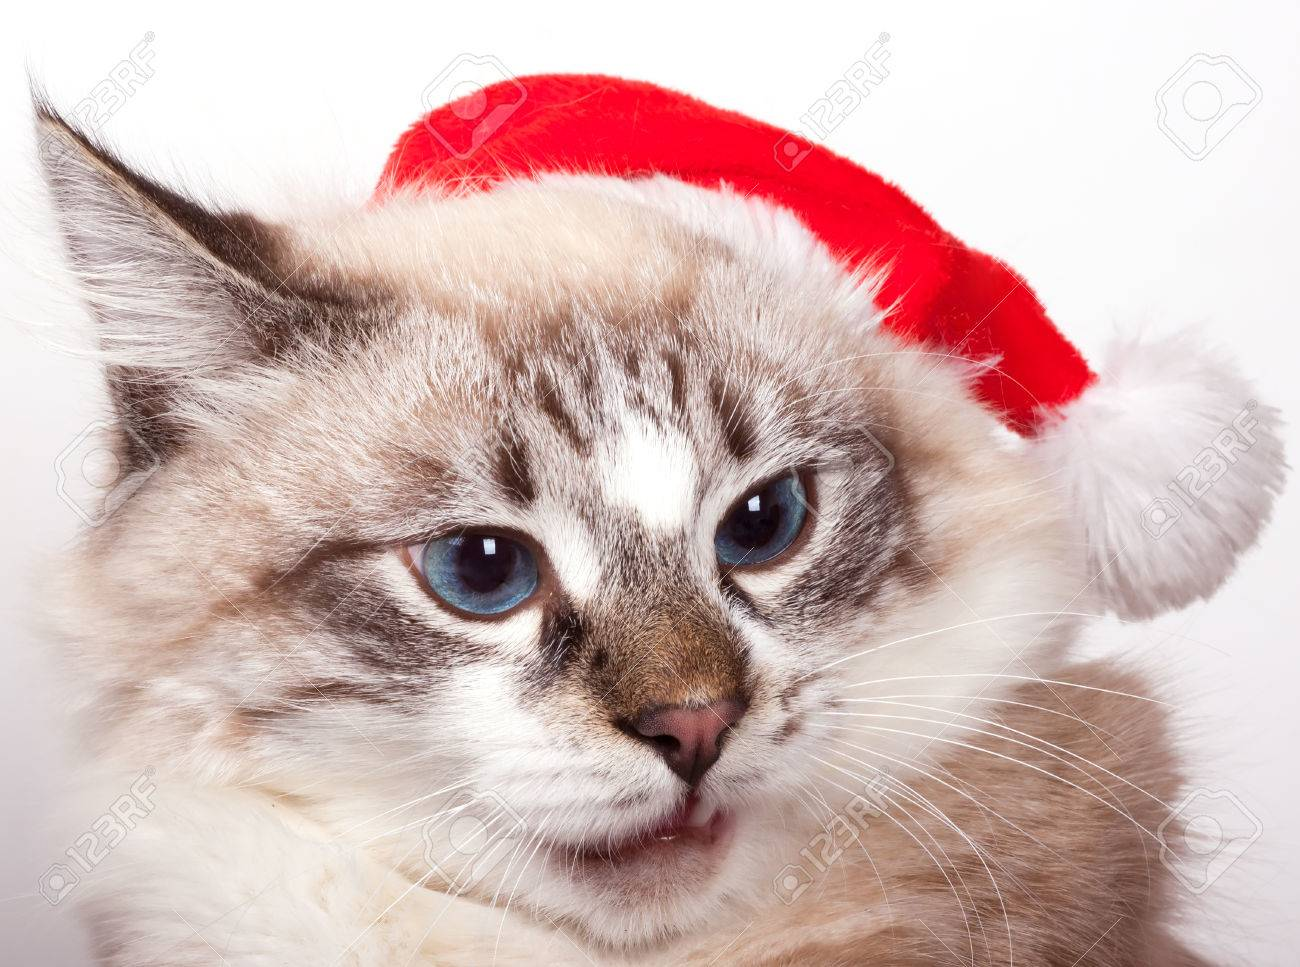 I m Santa Cat wearing a Santa Claus hat portrait - 23691709